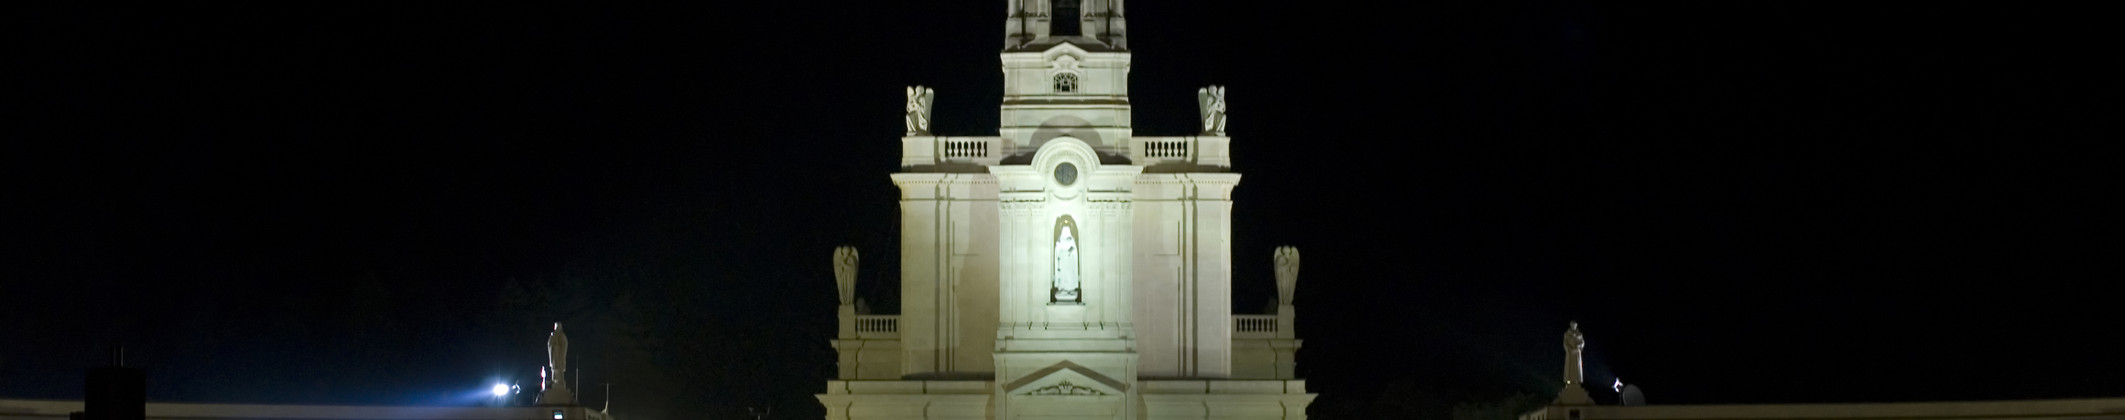 FATIMA, PORTUGAL - MAY 13.jpg